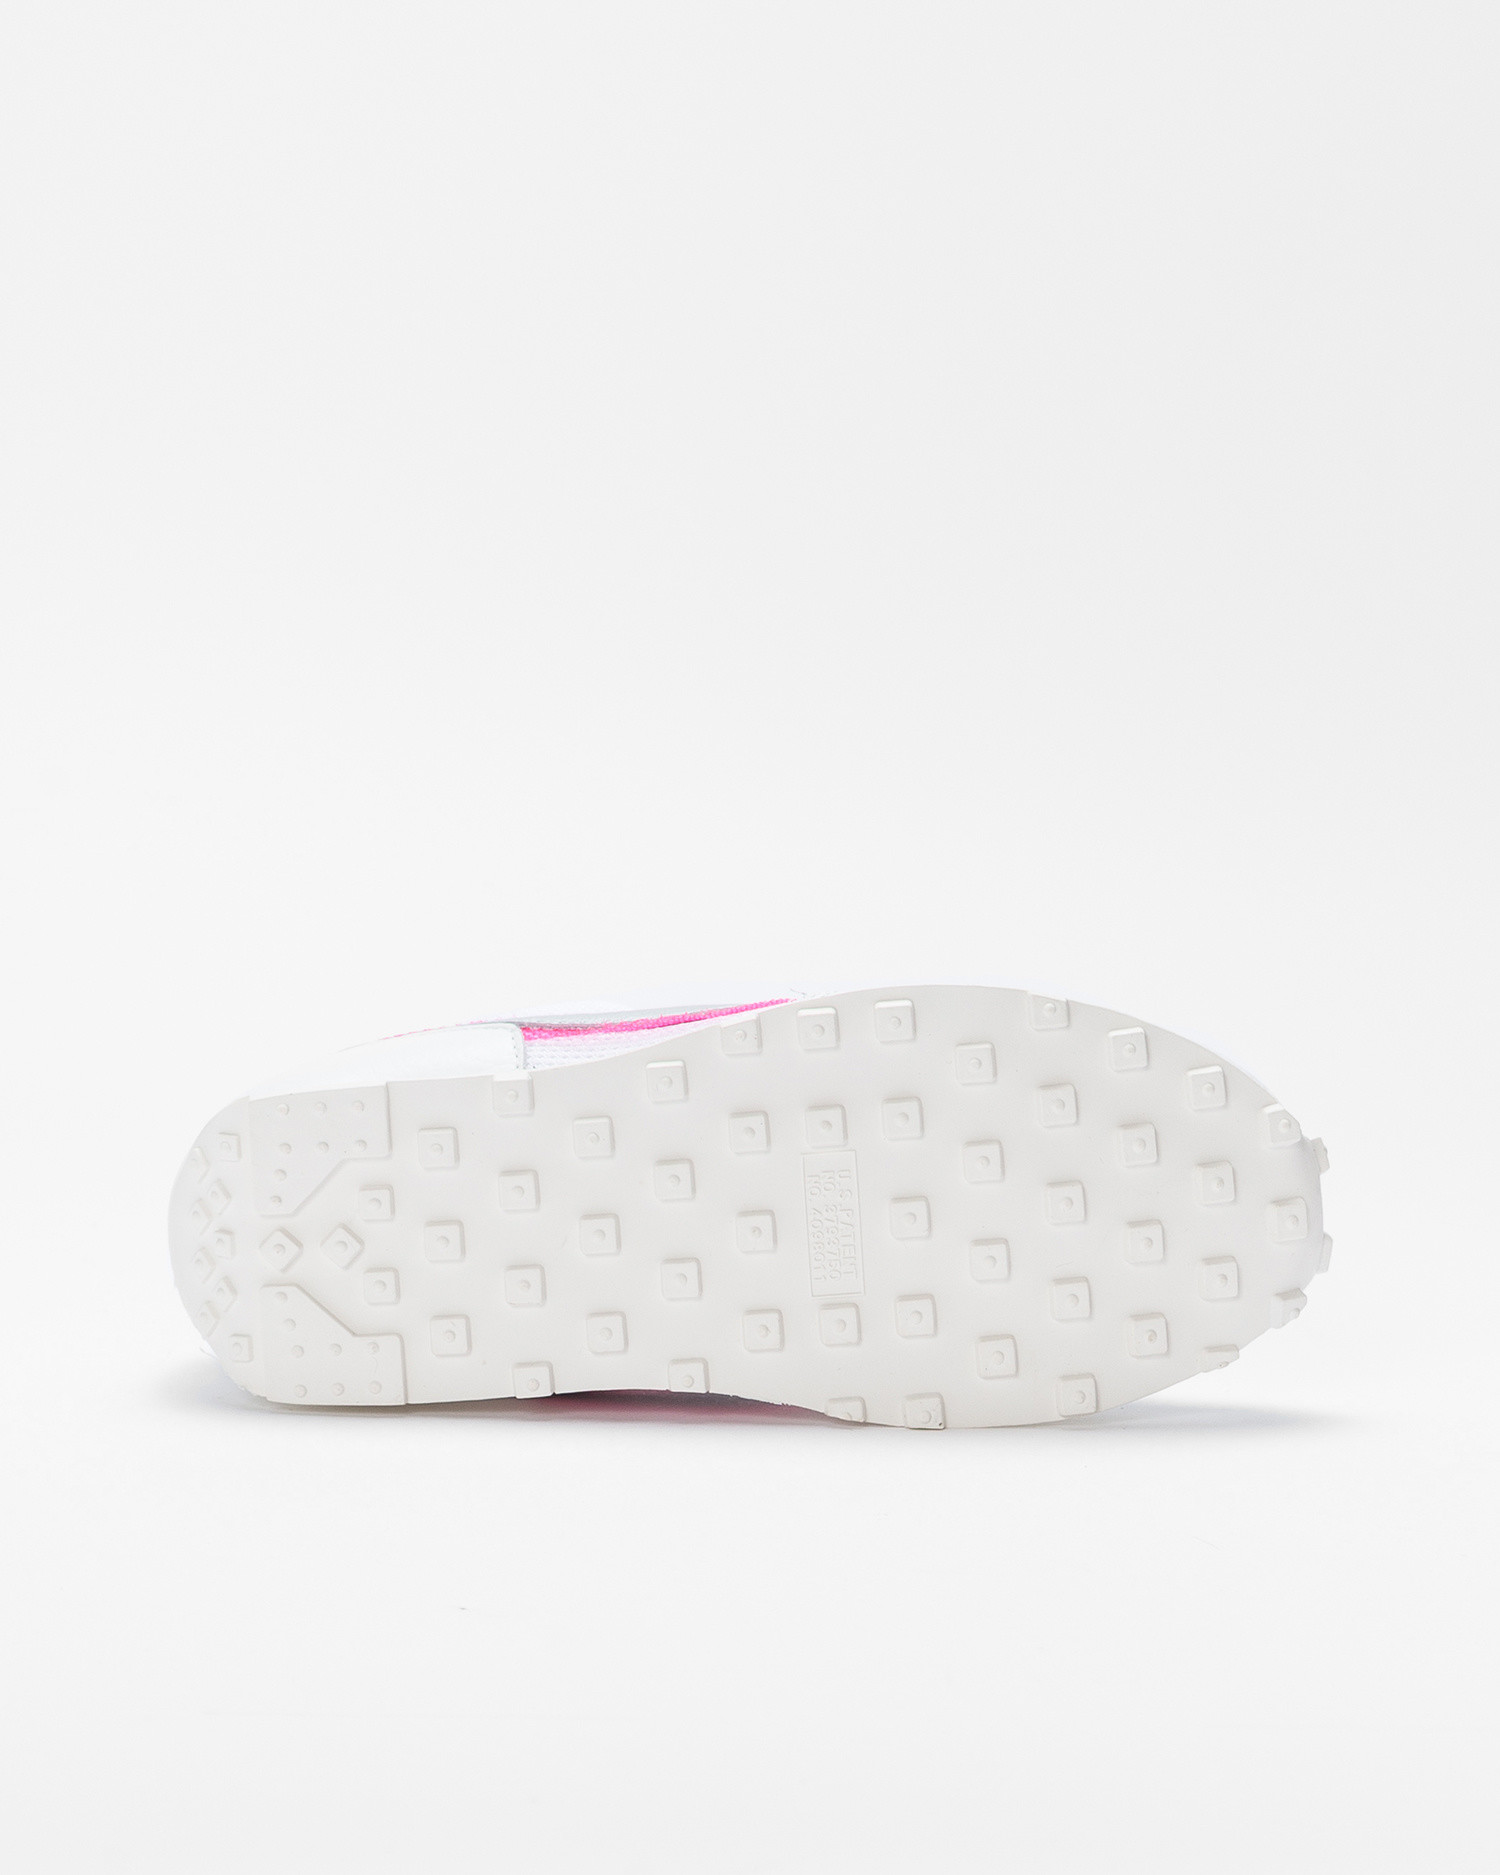 Nike Wmns Daybreak White/metallic silver-hyper pink